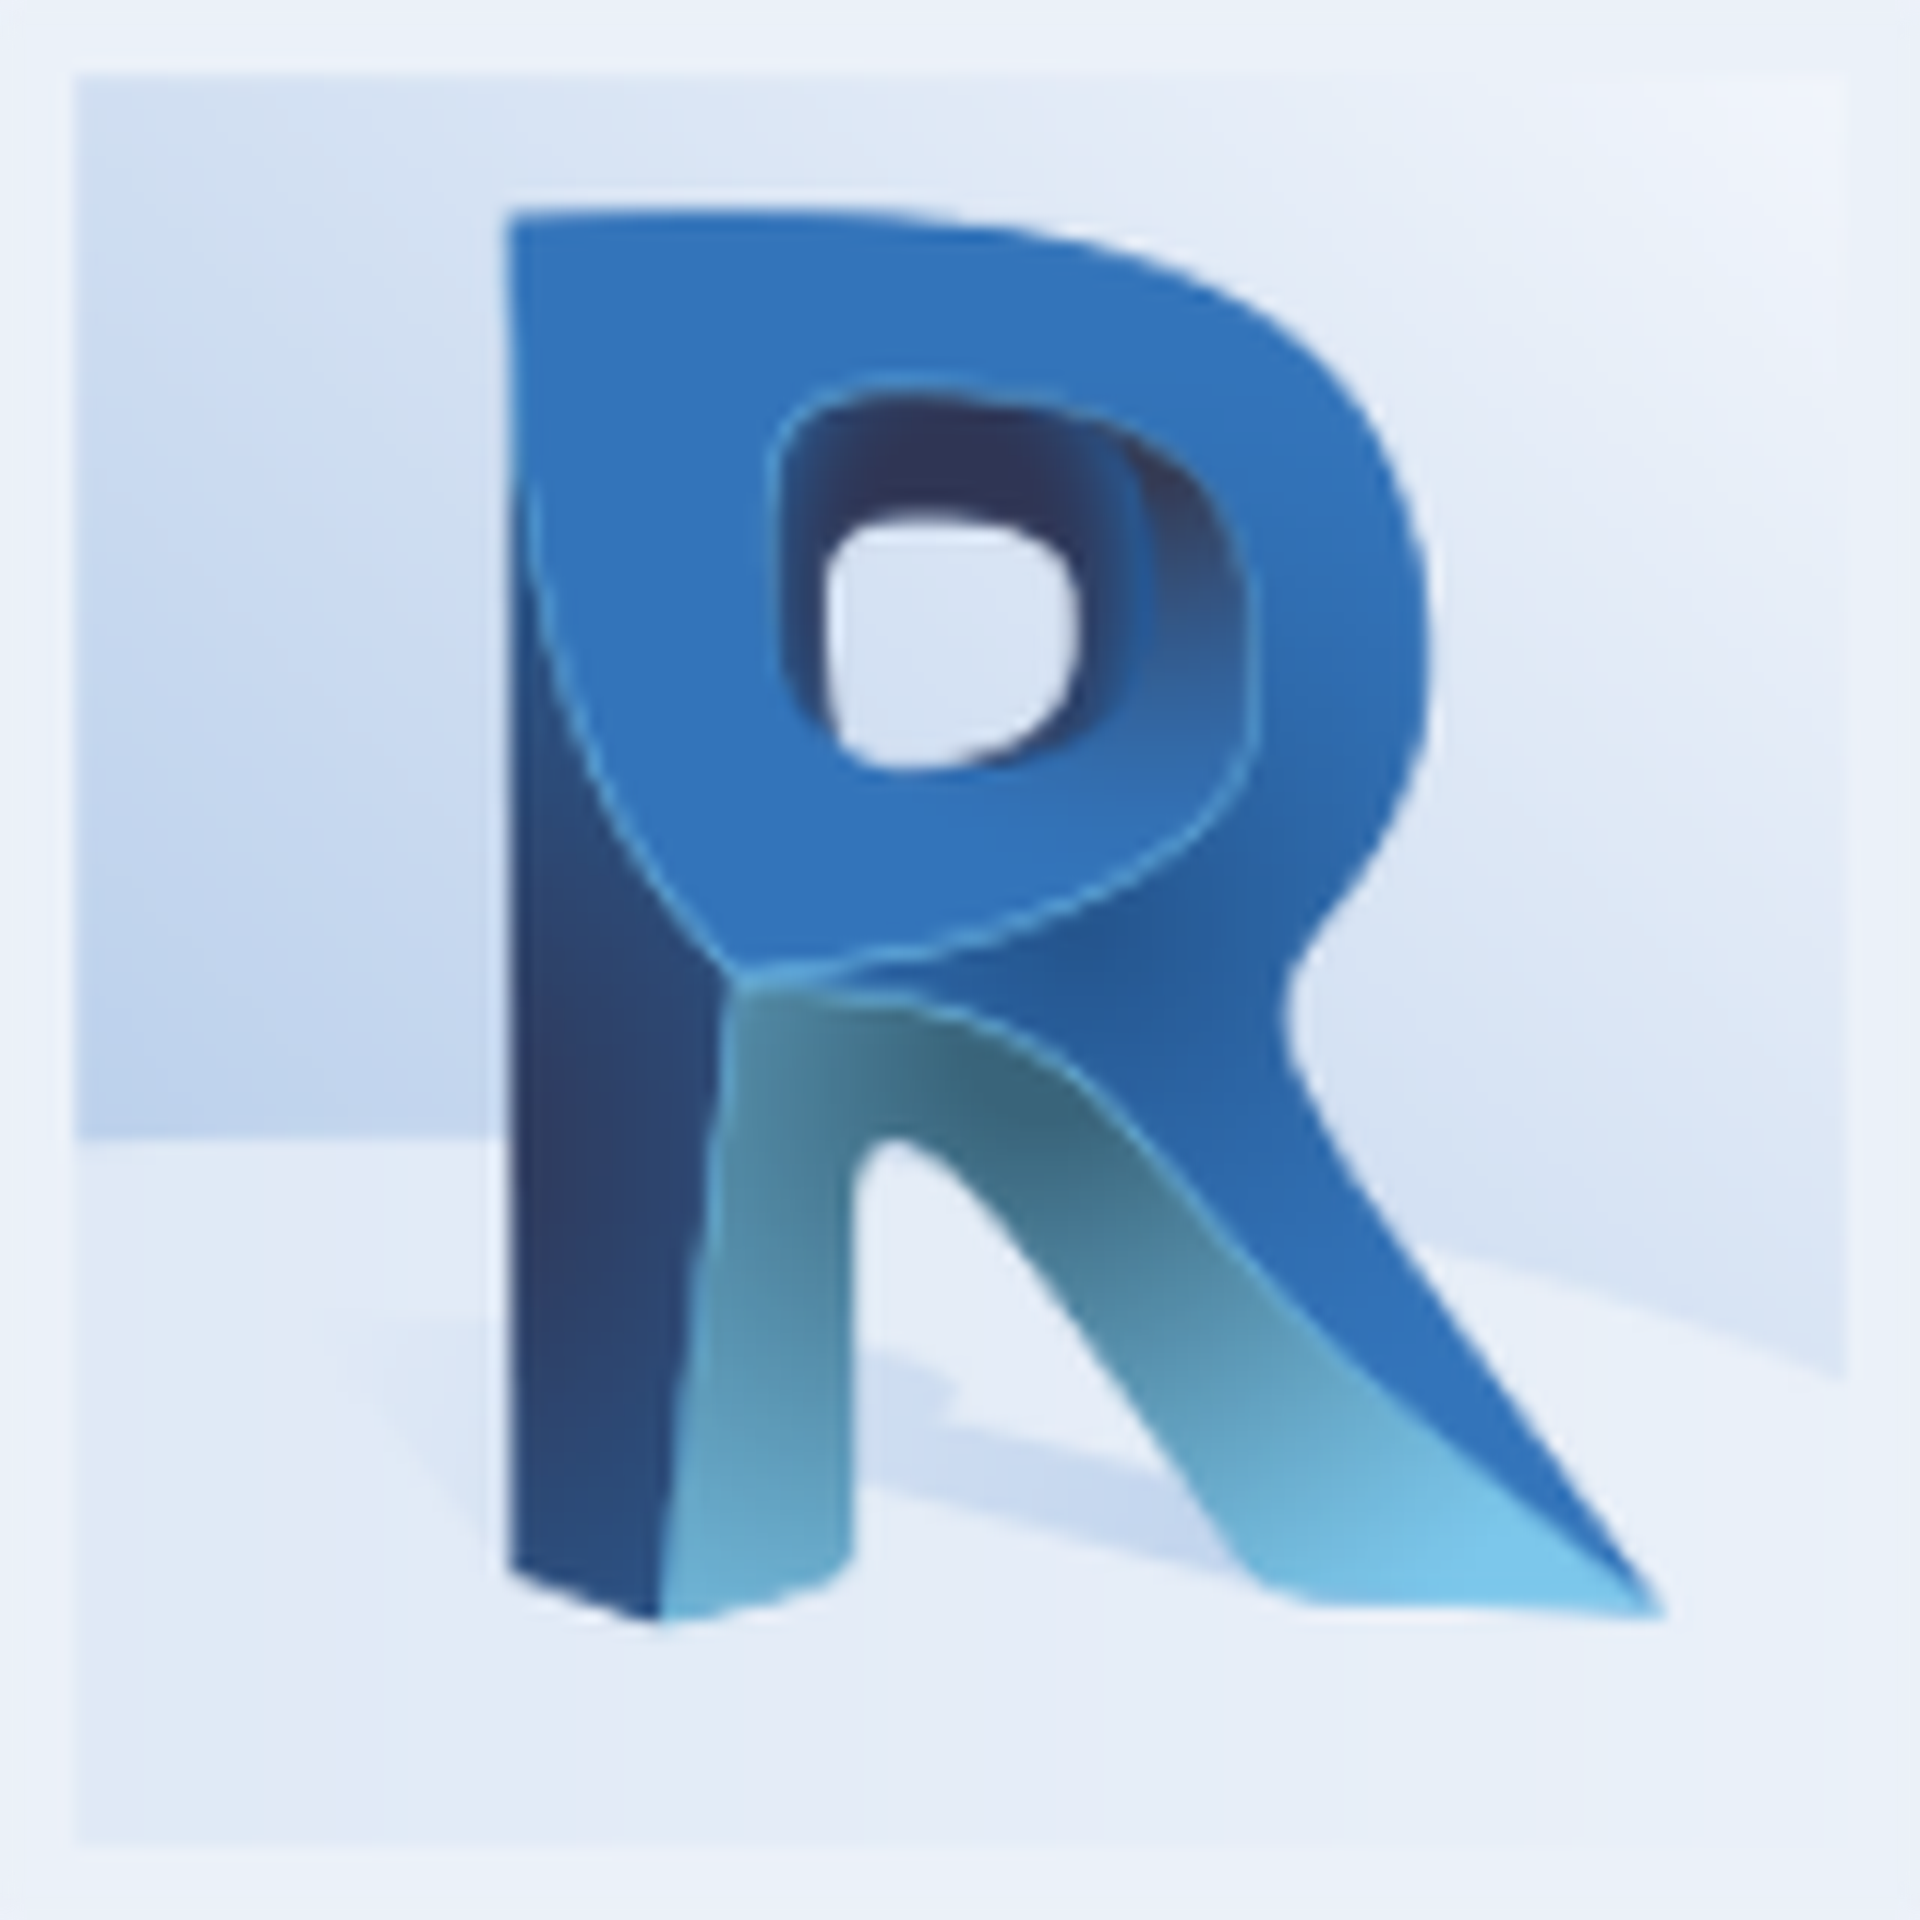 revit-icon-128px-2x